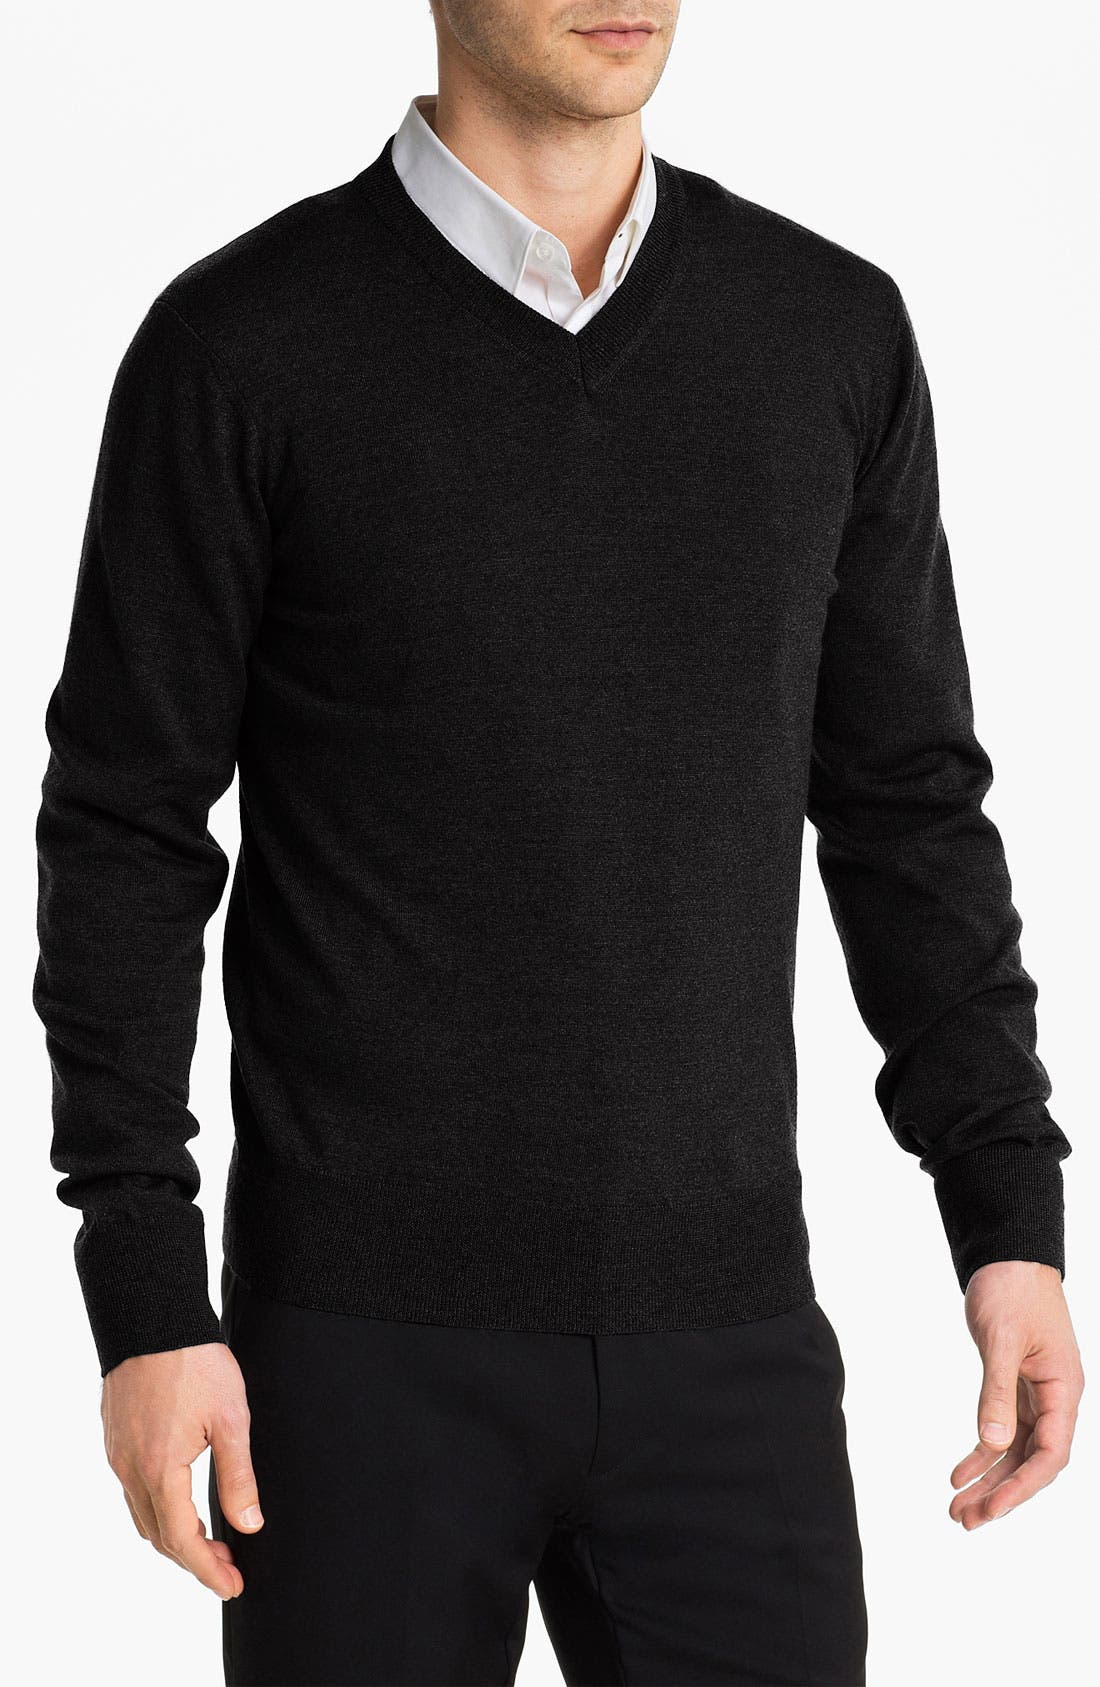 Alternate Image 1 Selected - HUGO Wool V-Neck Sweater